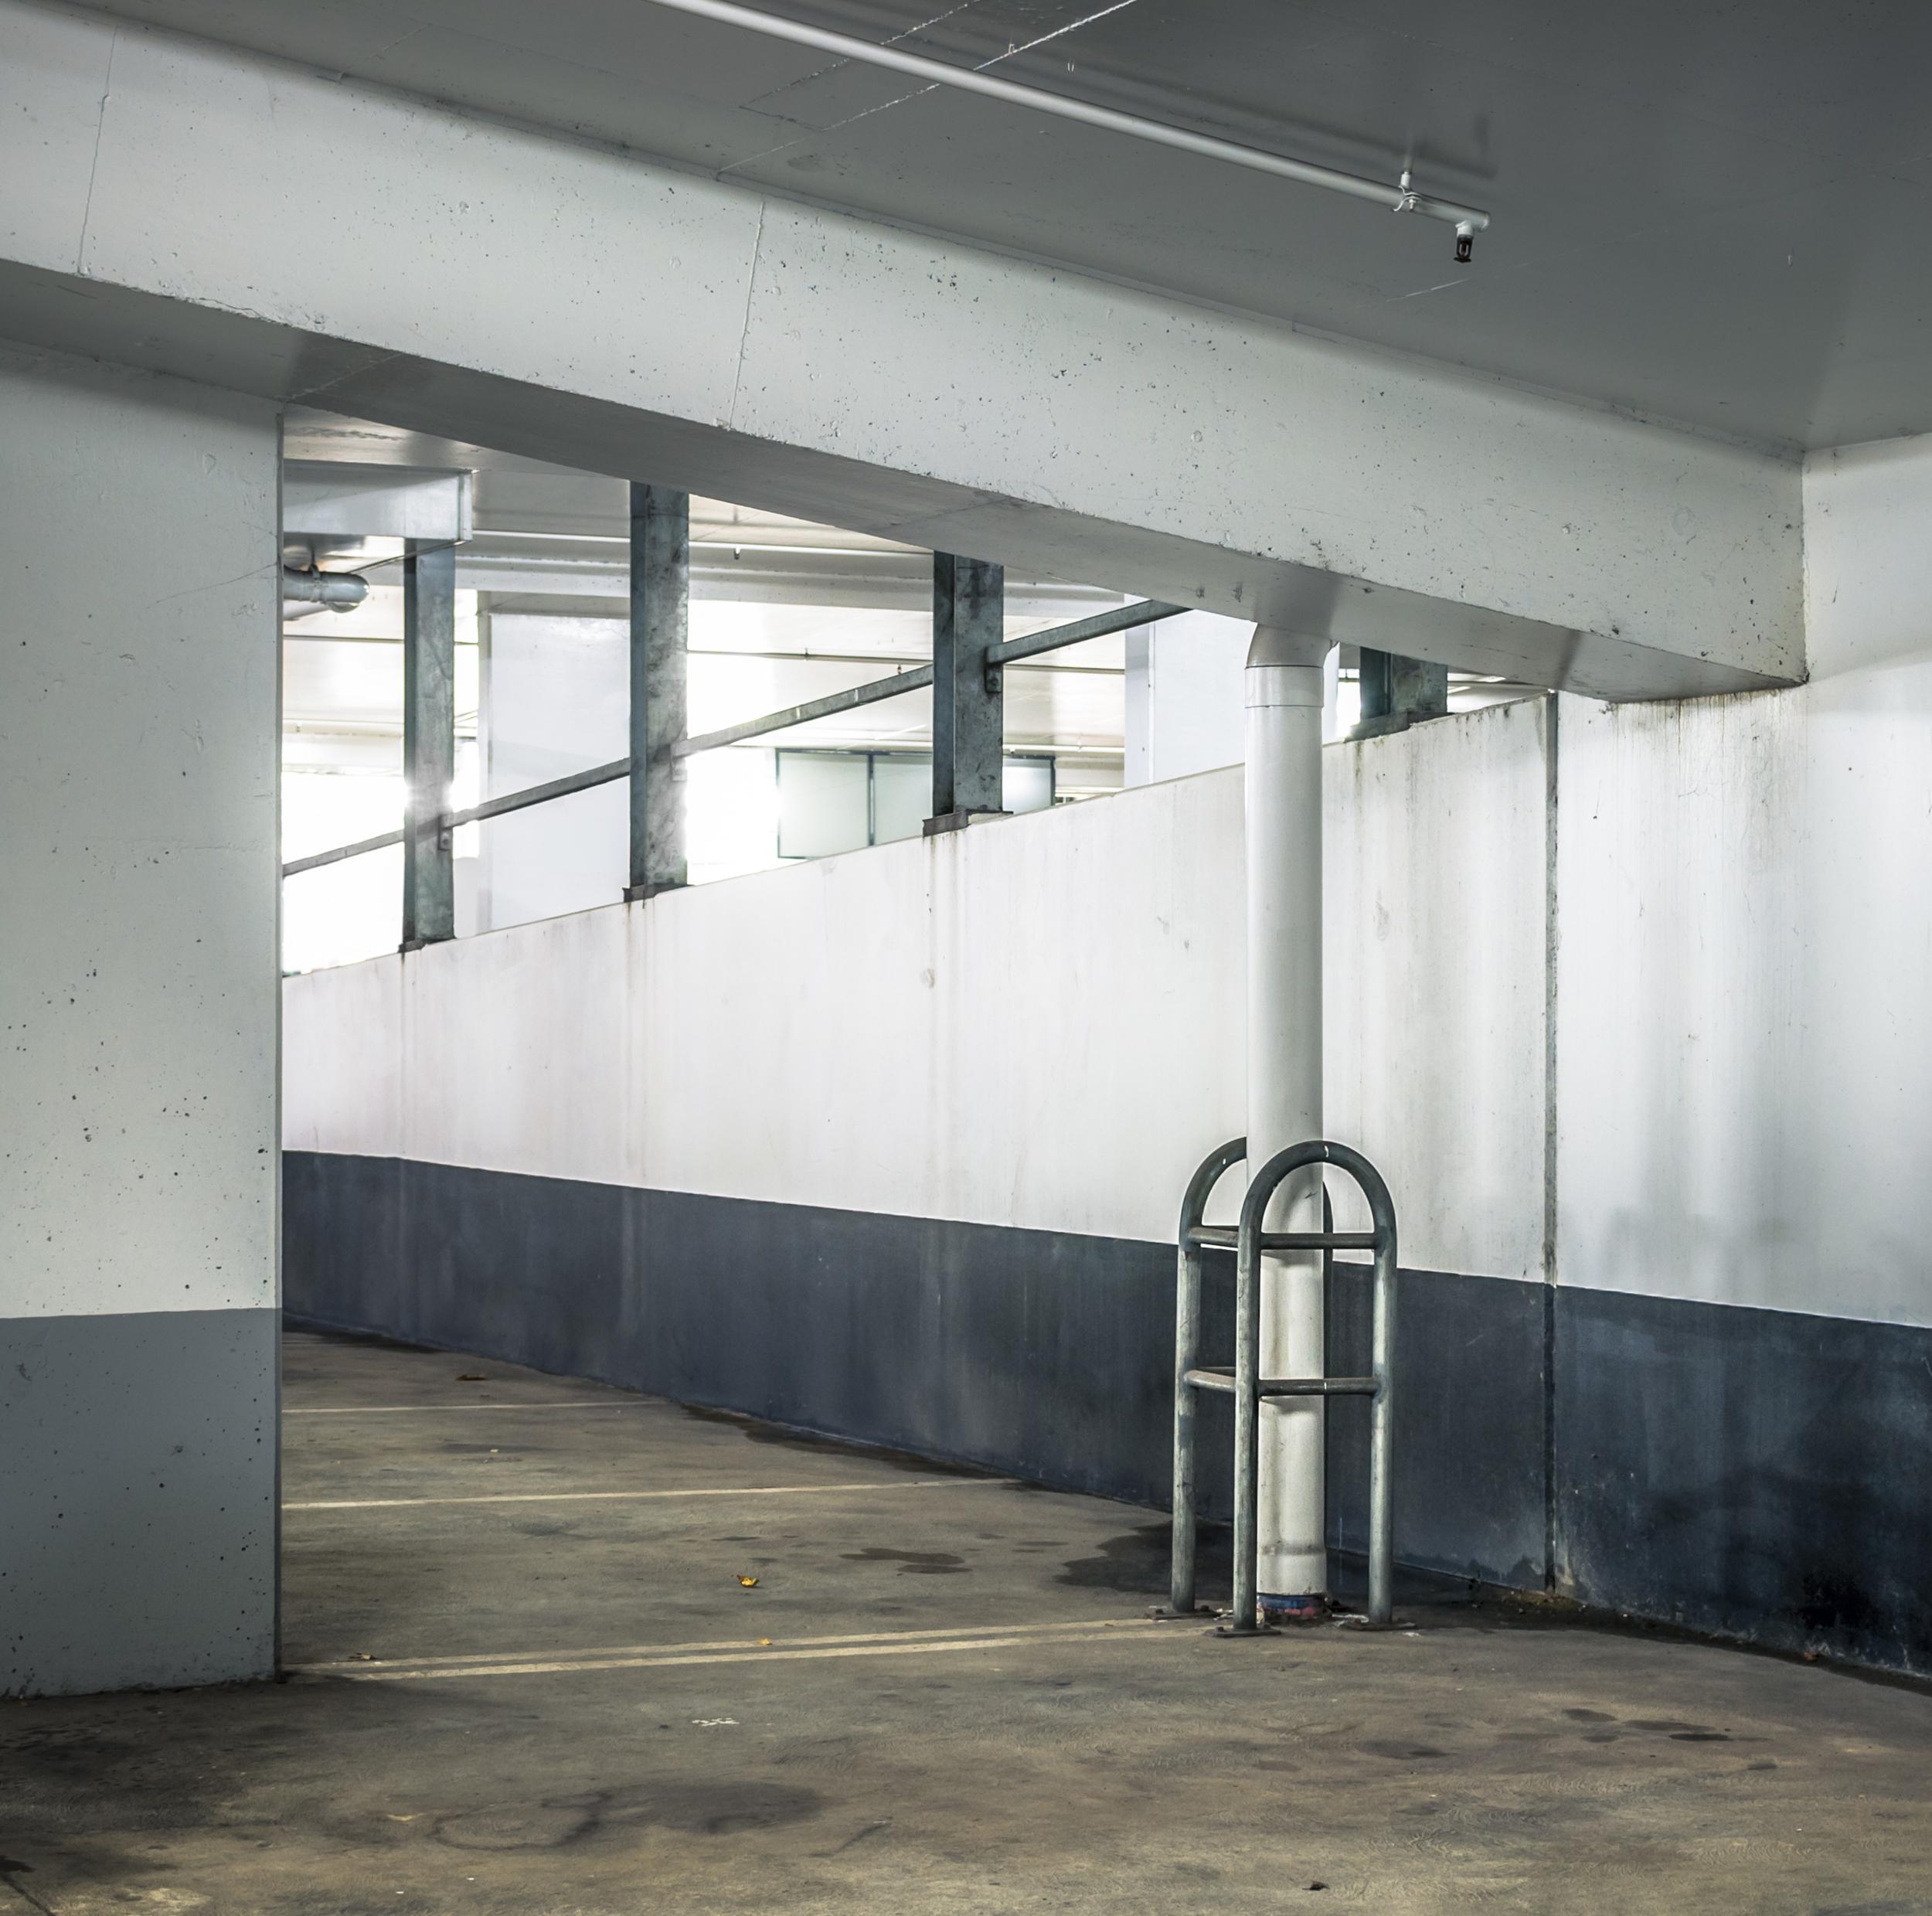 Empty Parking Interior.jpg